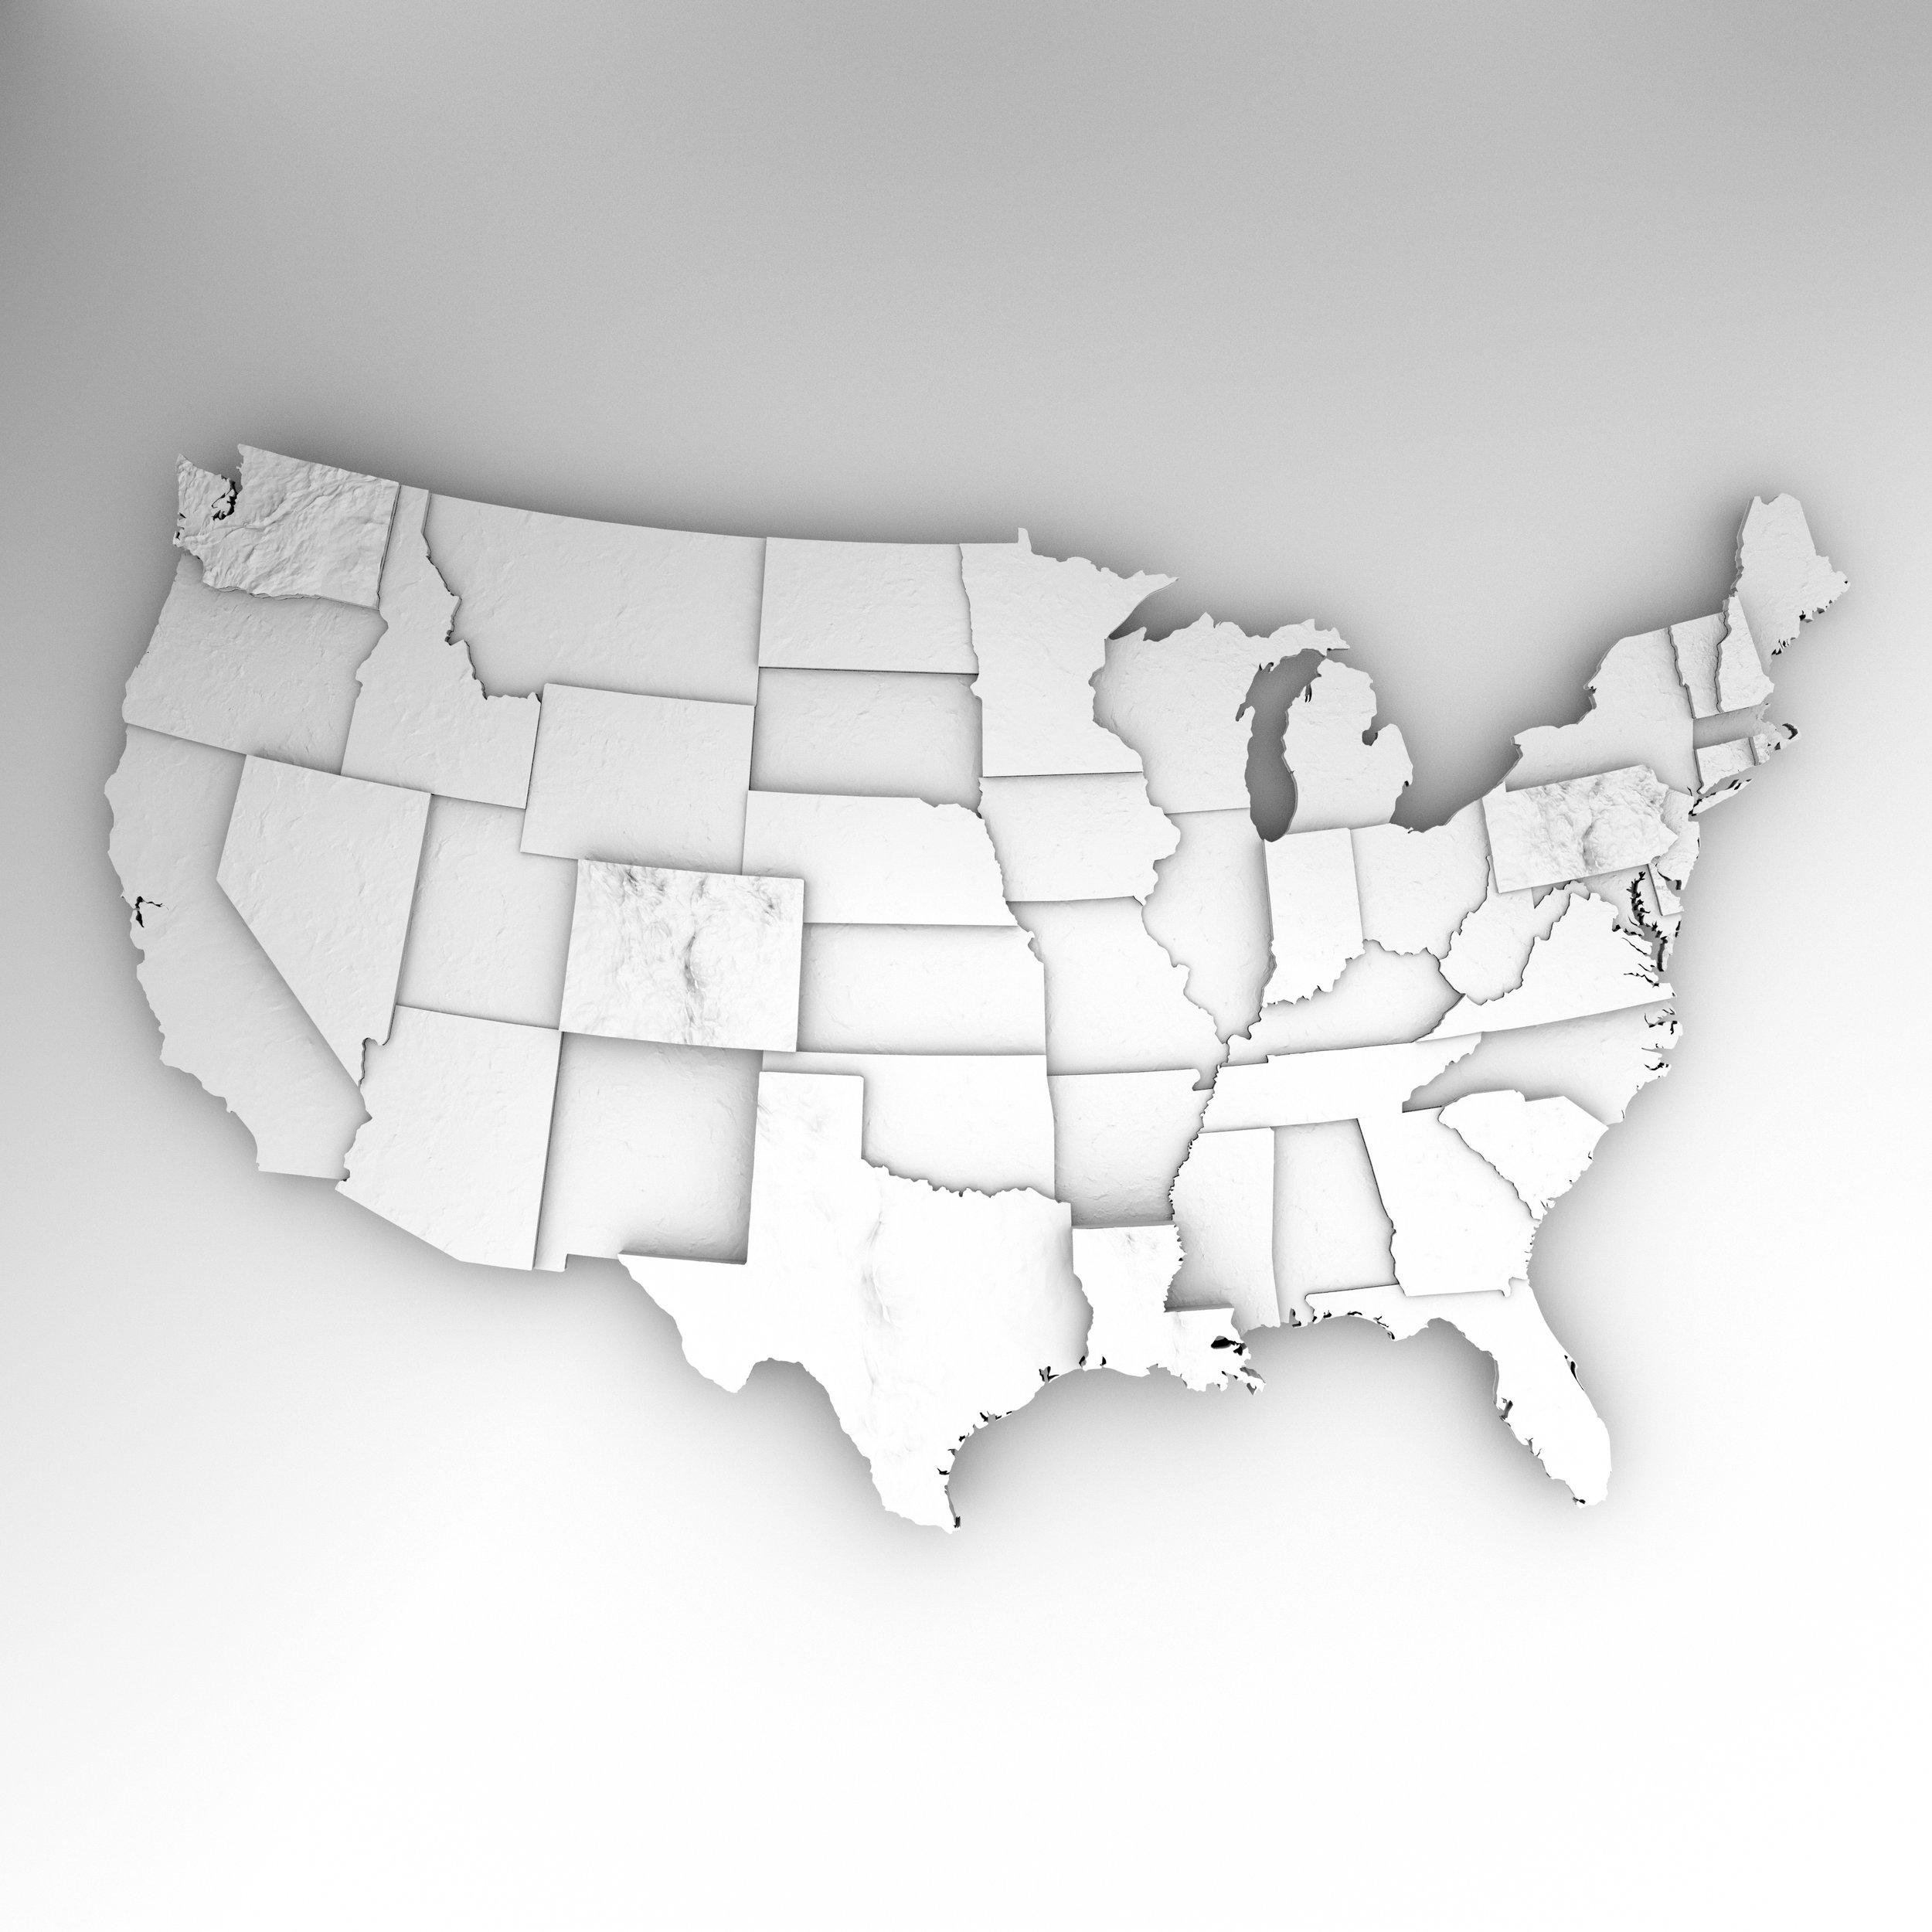 ACLU_Map_007_AO_0000.jpg